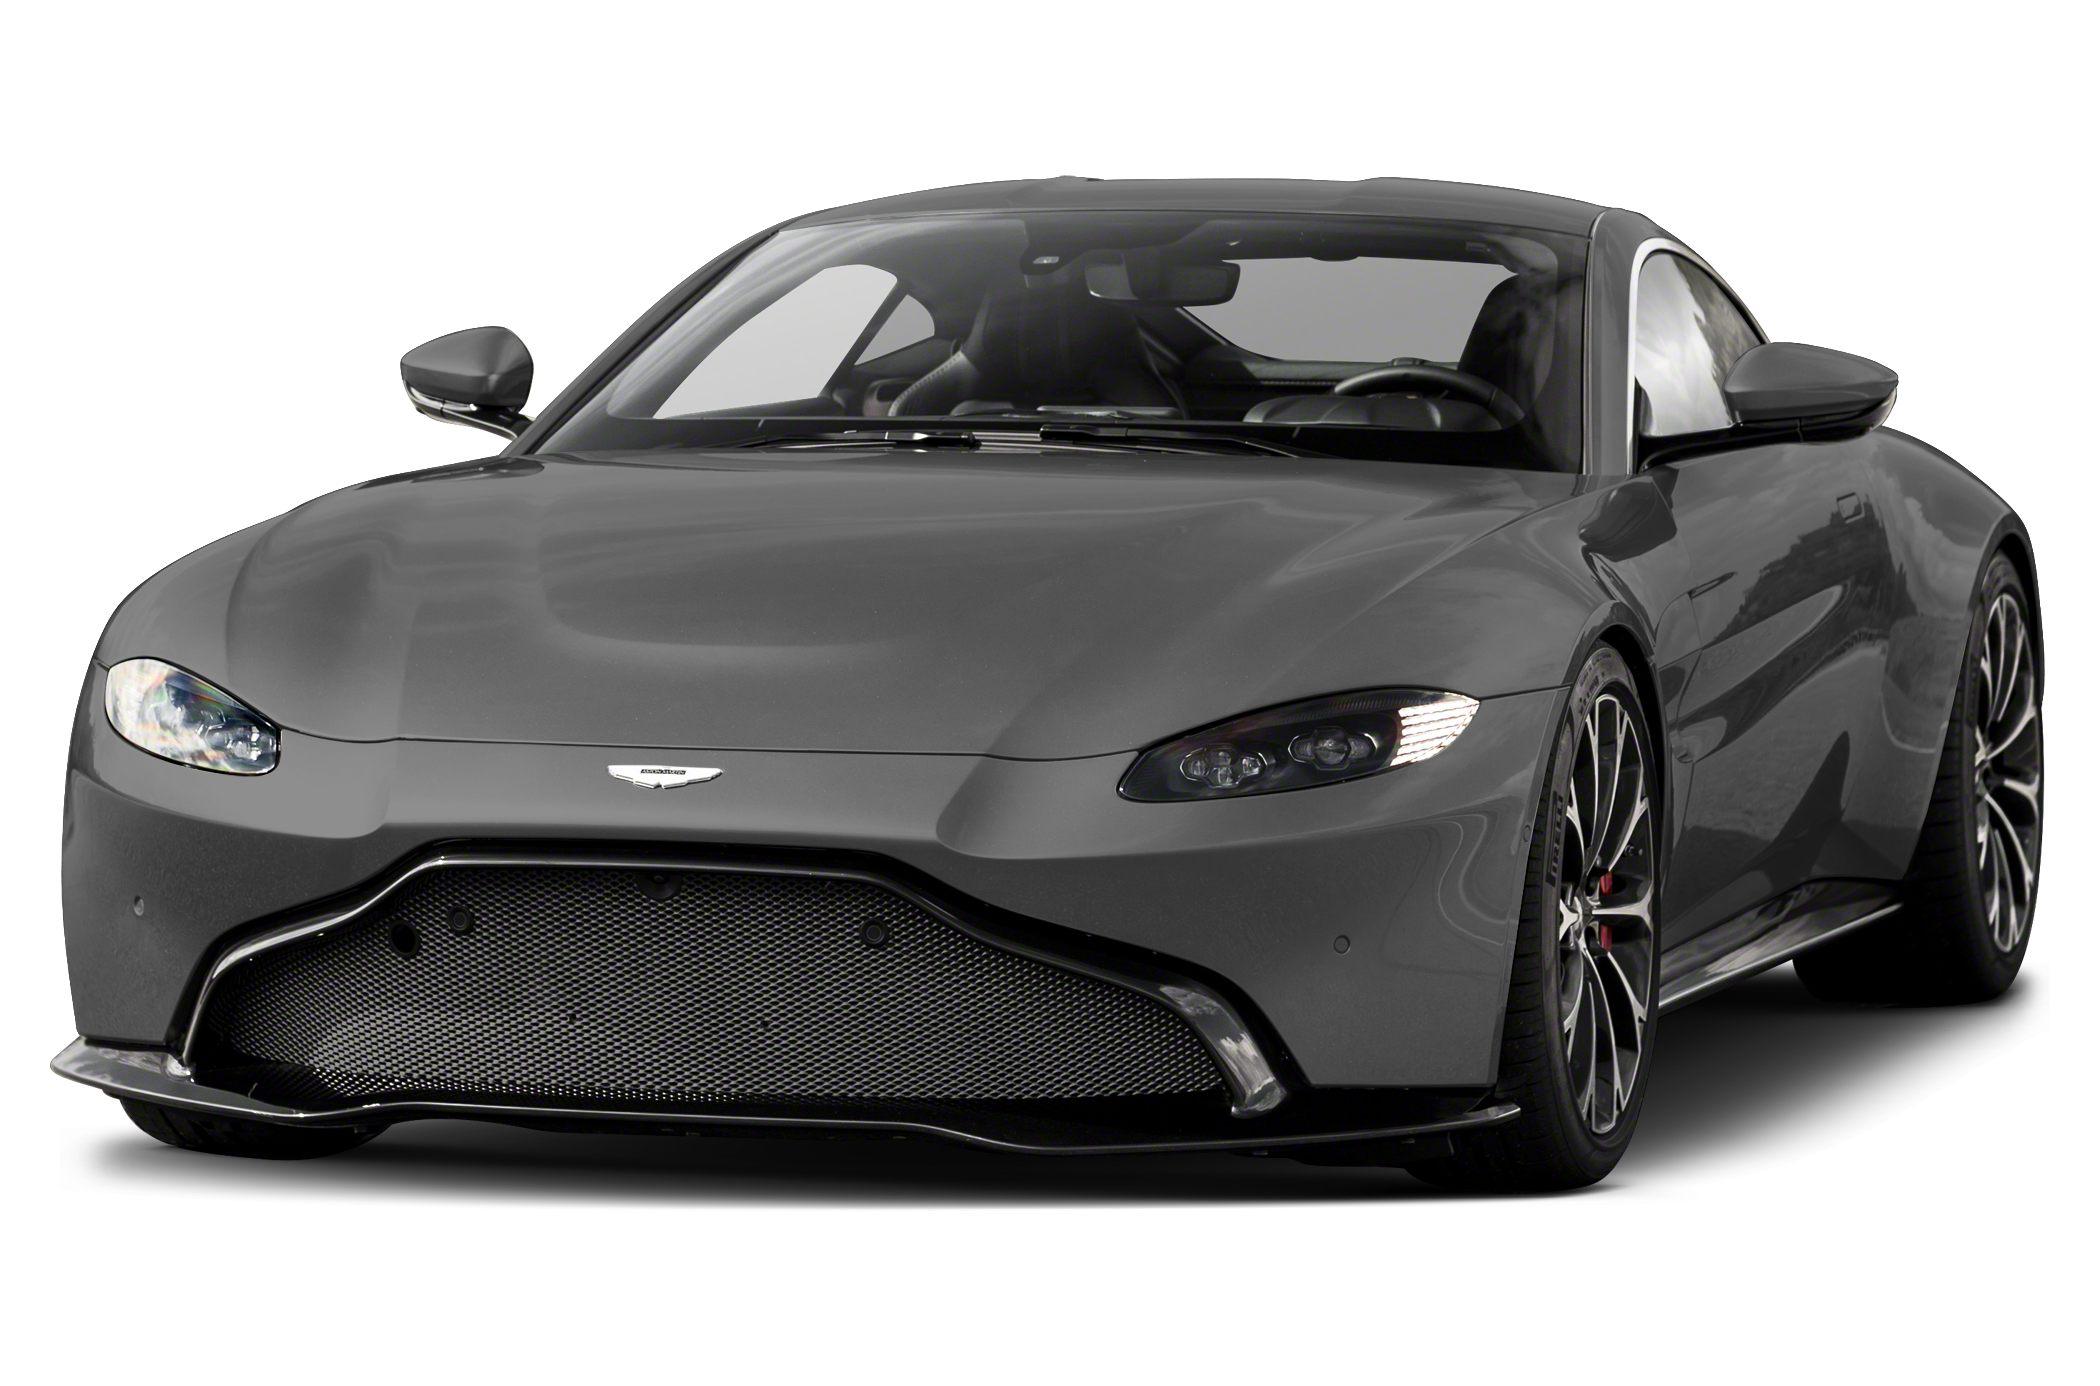 2020 Aston Martin Vantage Specs And Prices